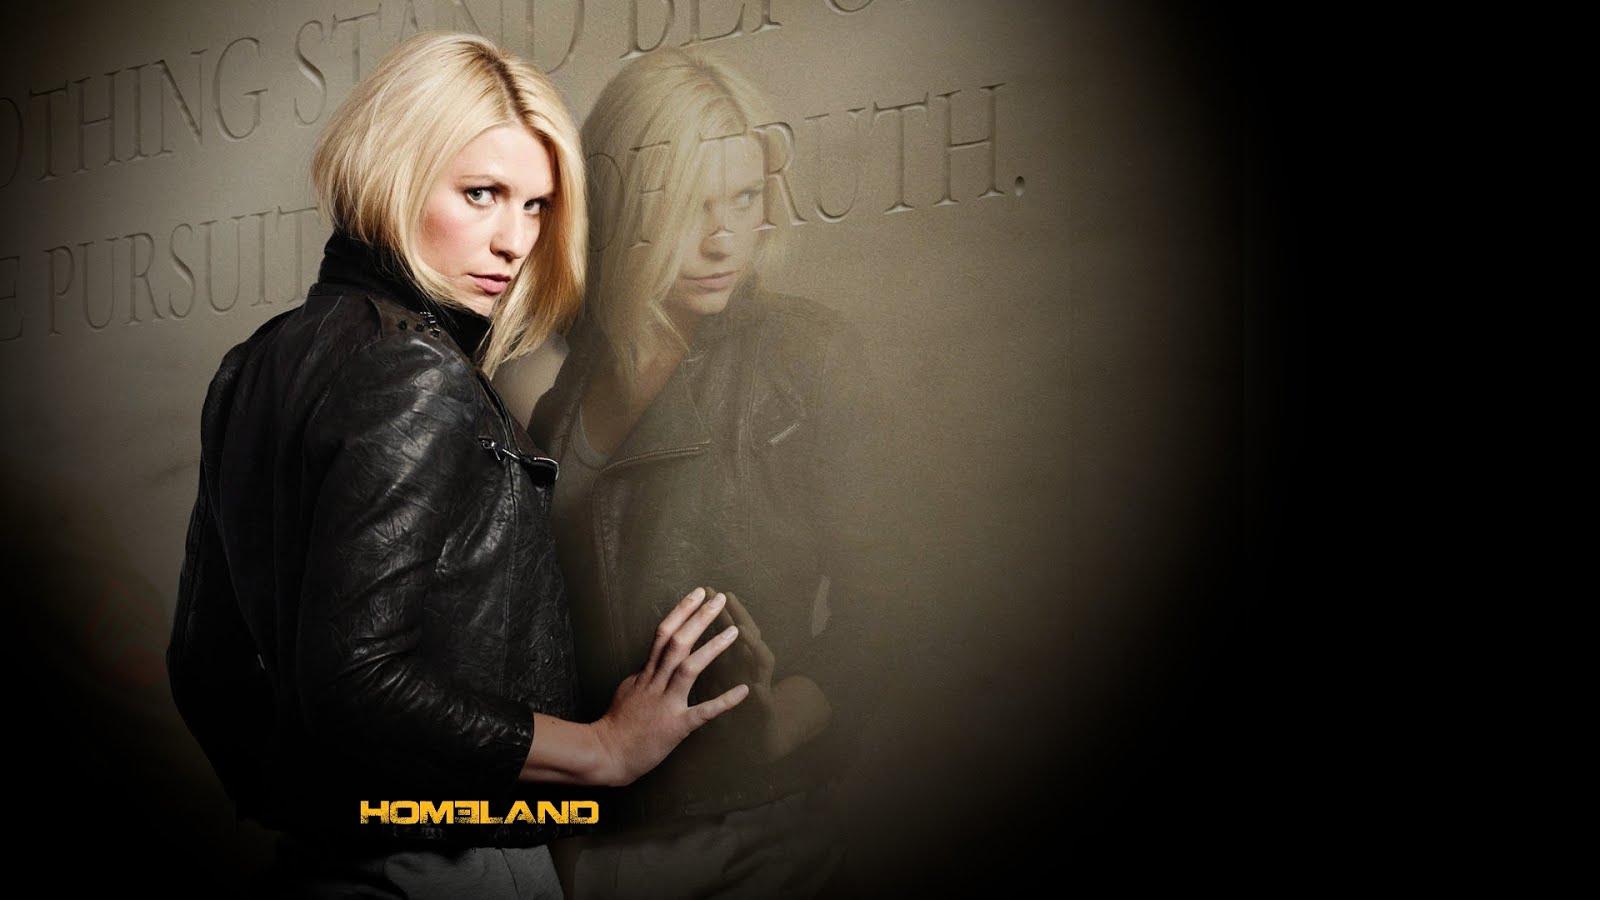 91+] Homeland Season 7 Wallpapers on WallpaperSafari